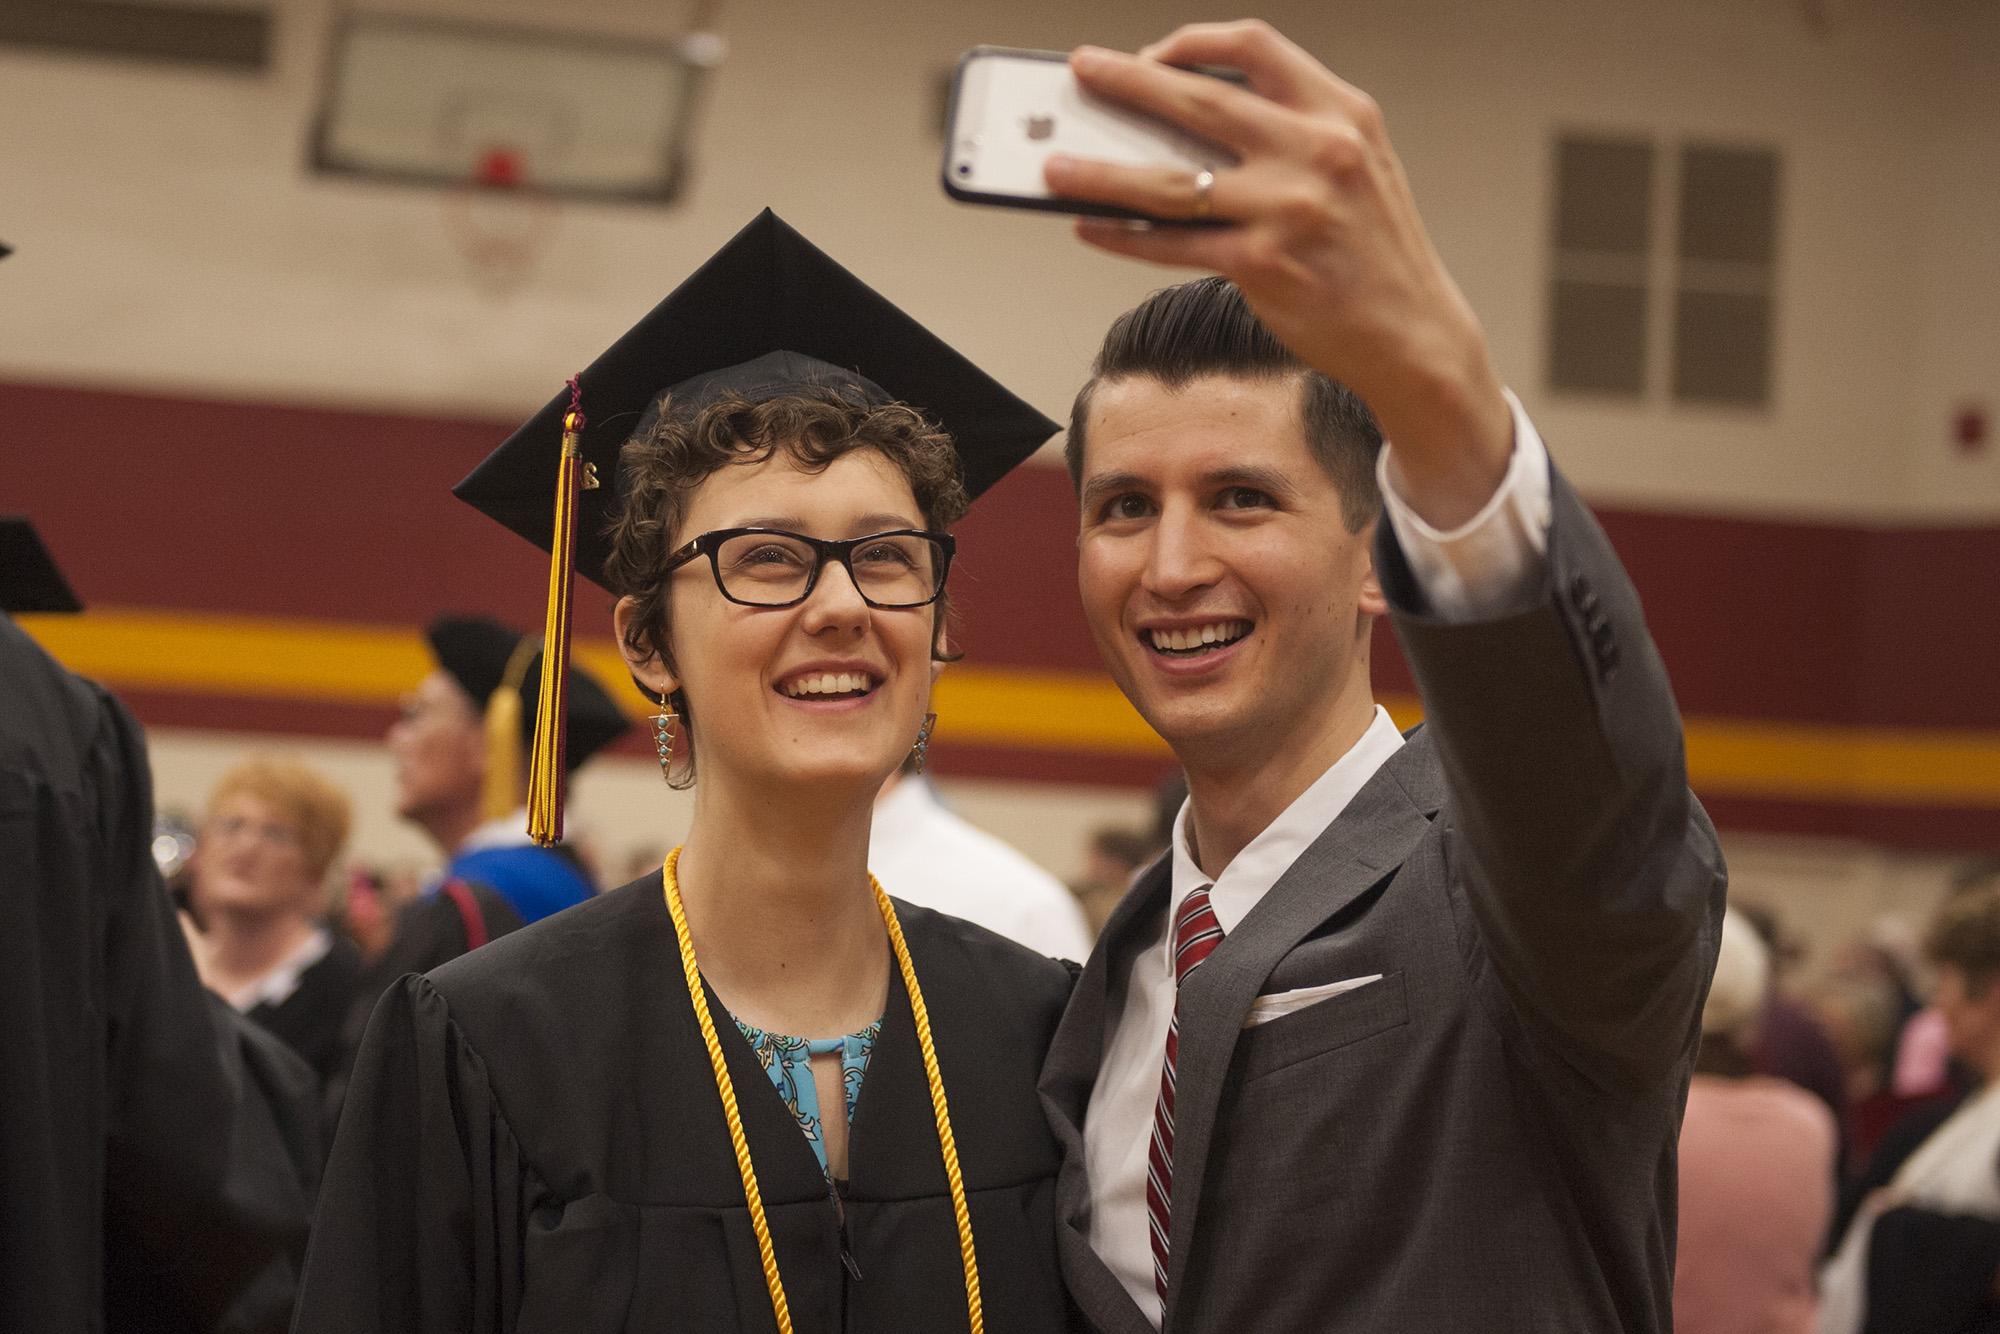 RaeLee Hightower '16 (Tulsa, Okla.) takes a selfie with English instructor Donovan Tann.